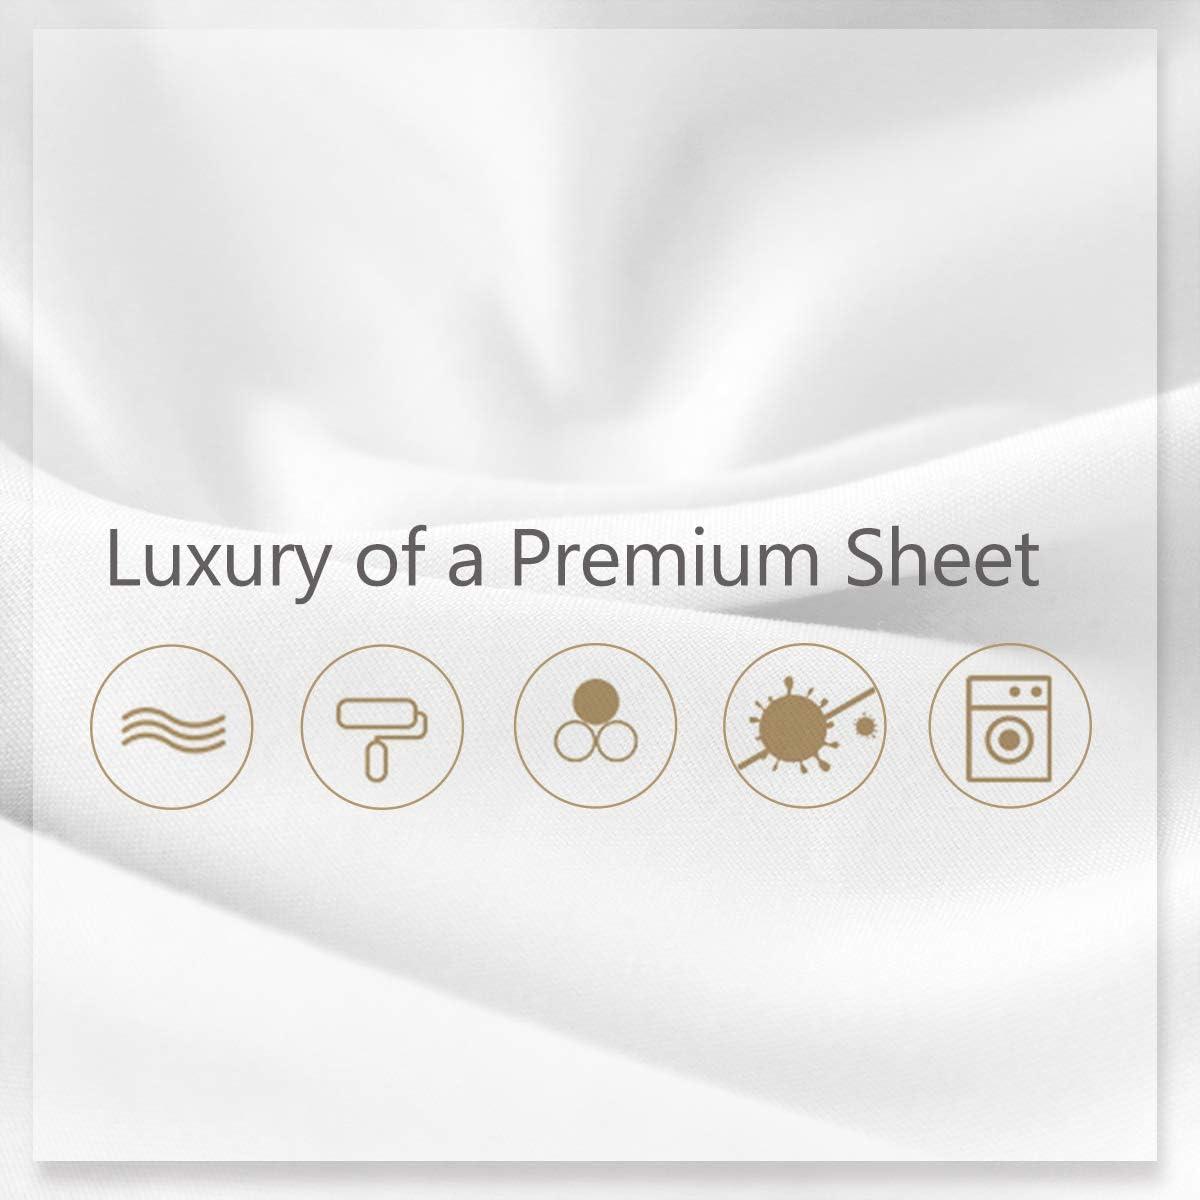 DBNMKK Premium Quality Flat Sheet Only 1800 Microfiber Twin Size Black Top Flat Sheet Deluxe 100/% Hypoallergenic Bed Sheets Lightweight Bedding Sheet